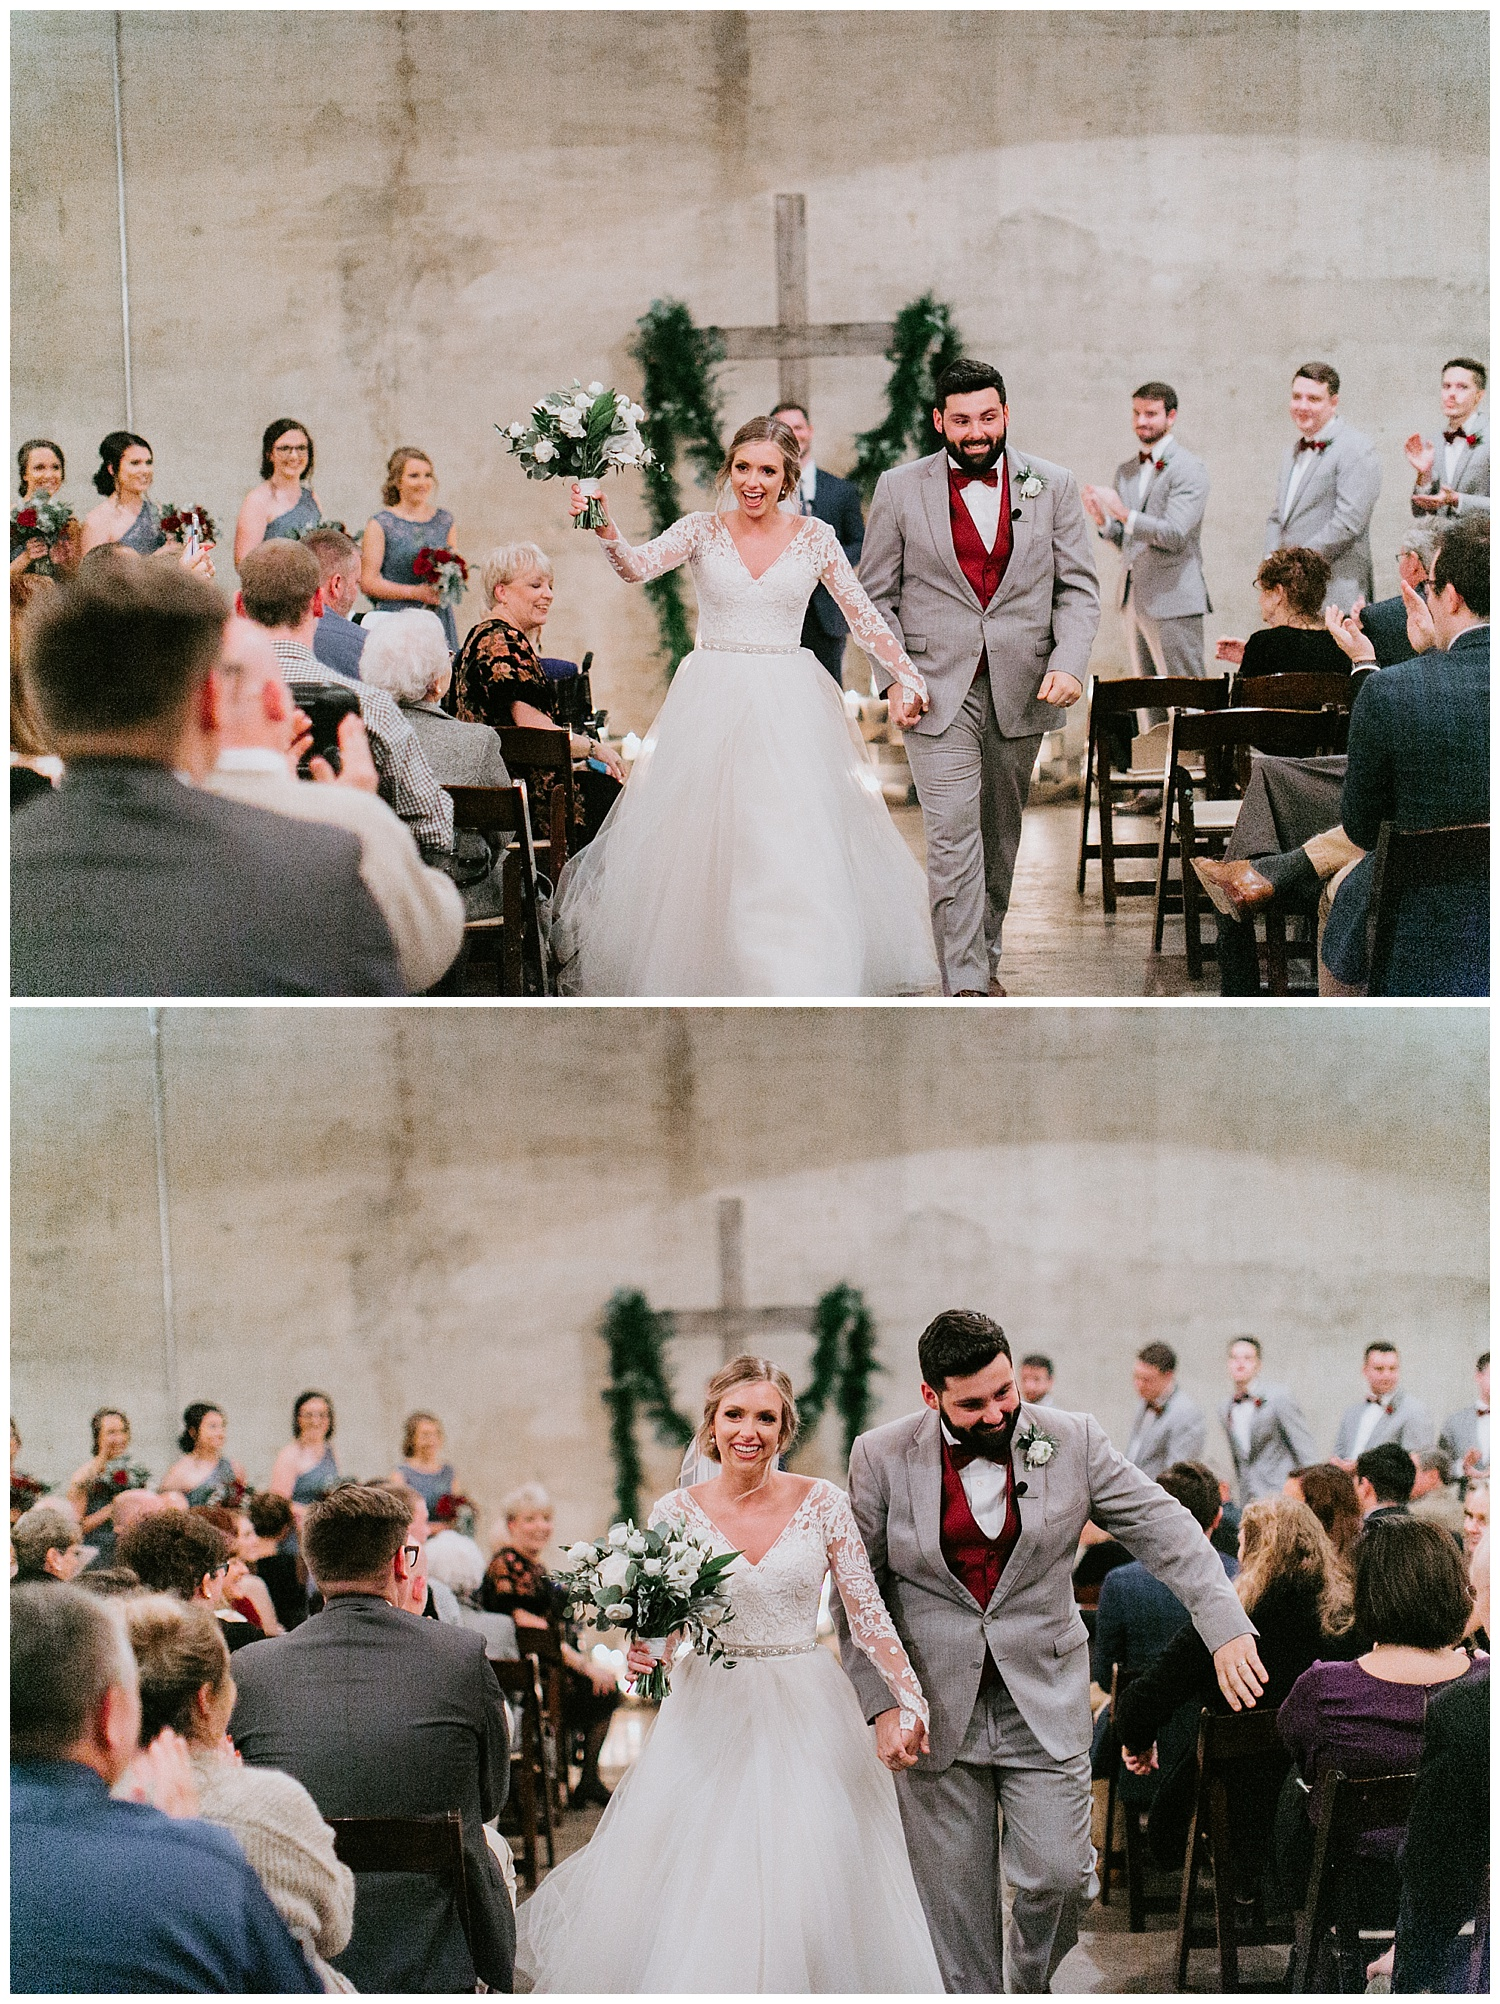 winter-wedding-the standard-knoxville_2019-01-23_0075.jpg